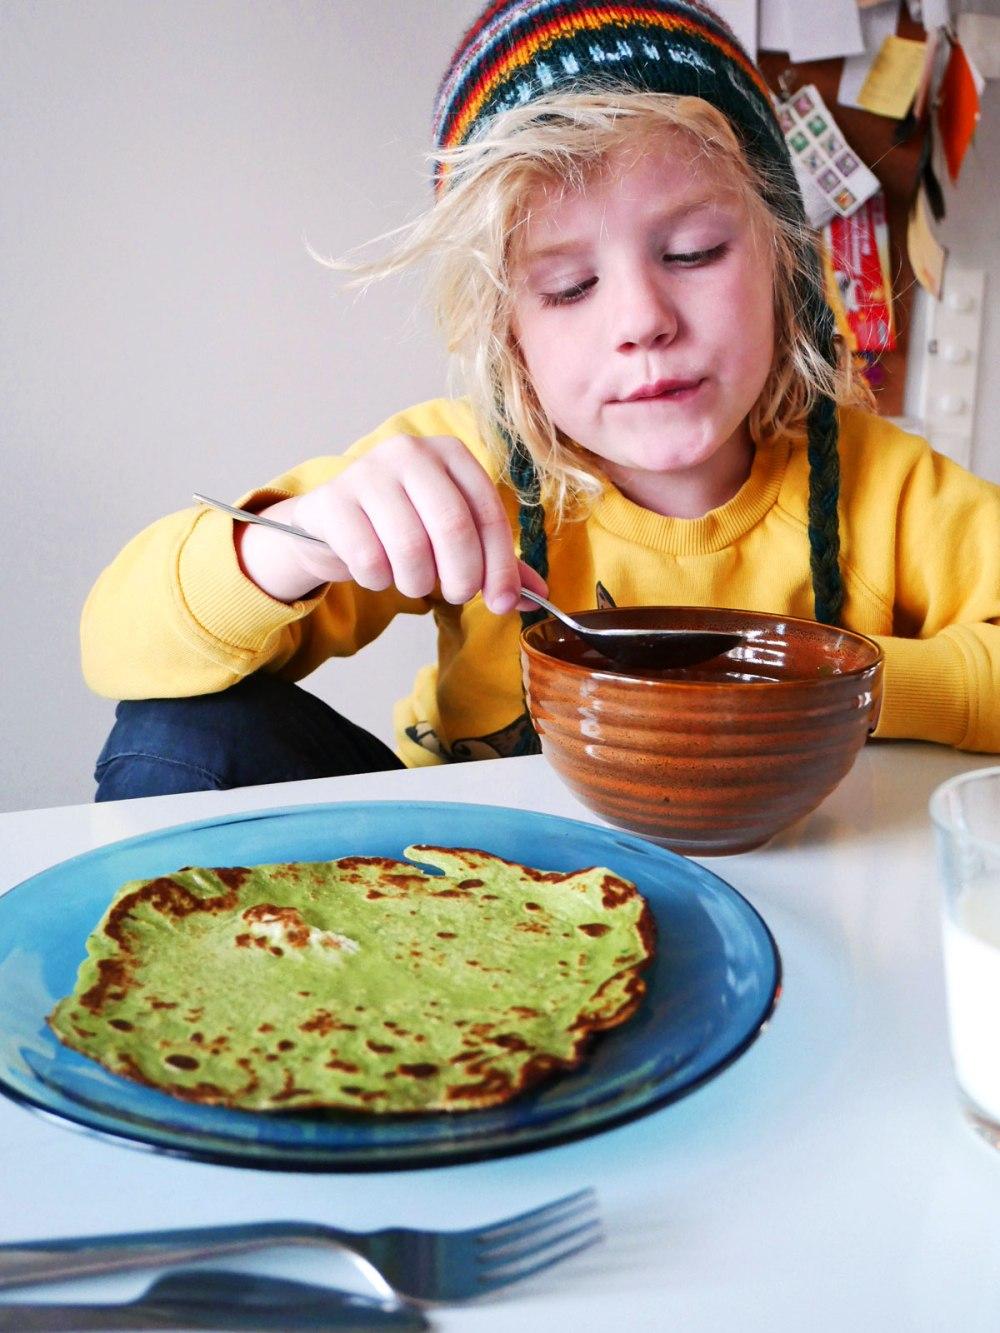 sigge-soppa-pannkaka-2